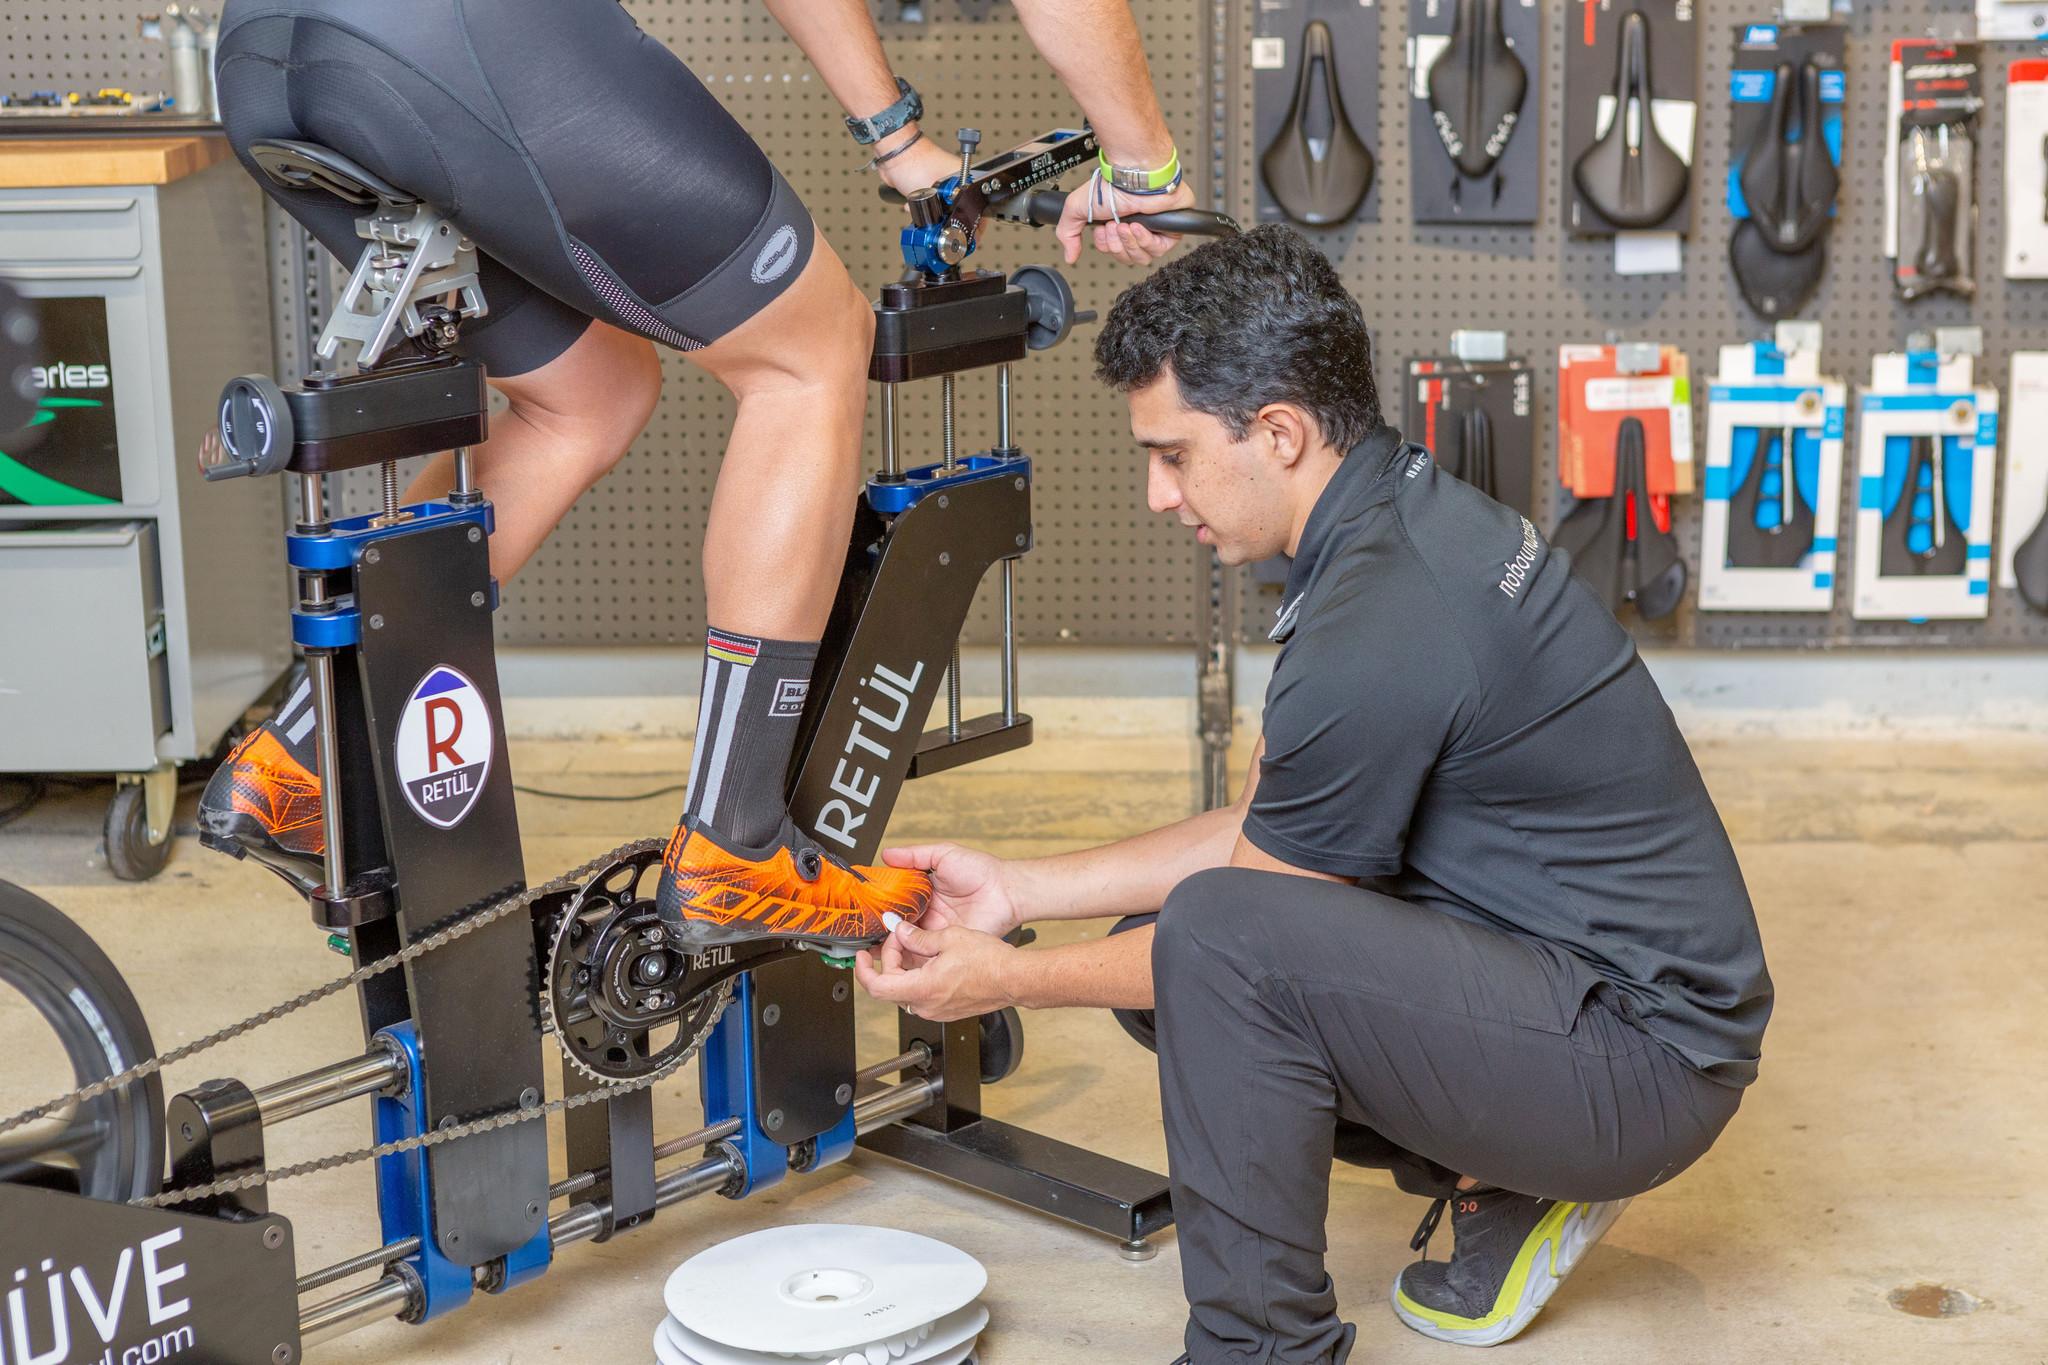 man adjusting cyclist shoes